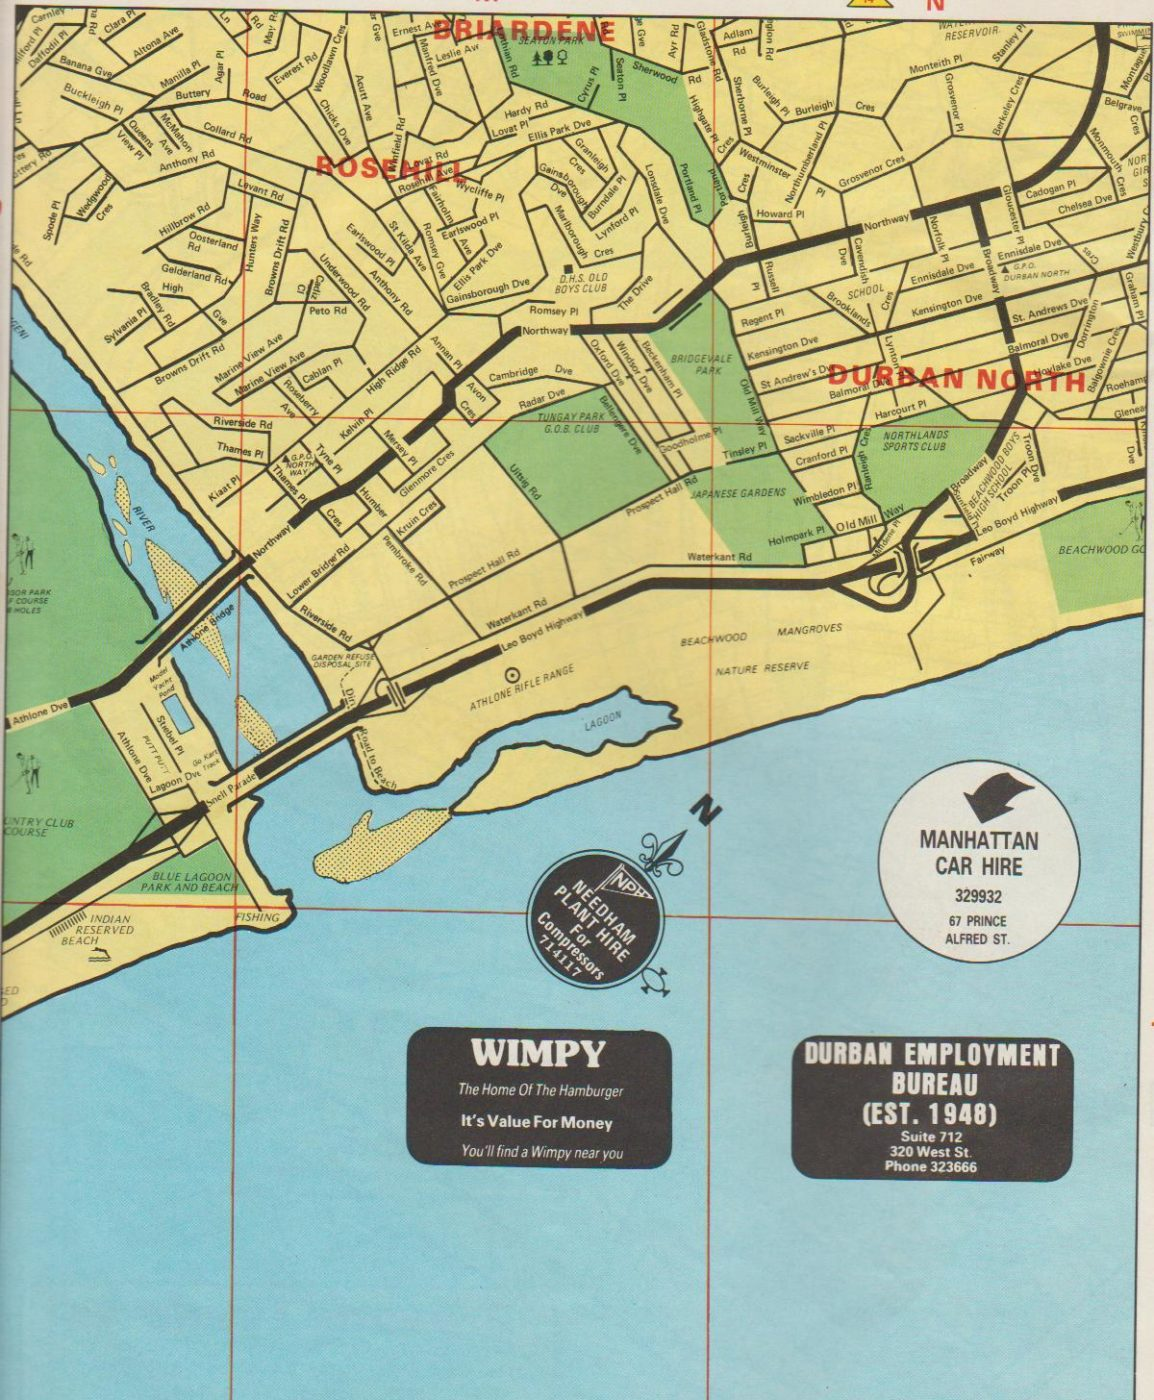 DBN North Map